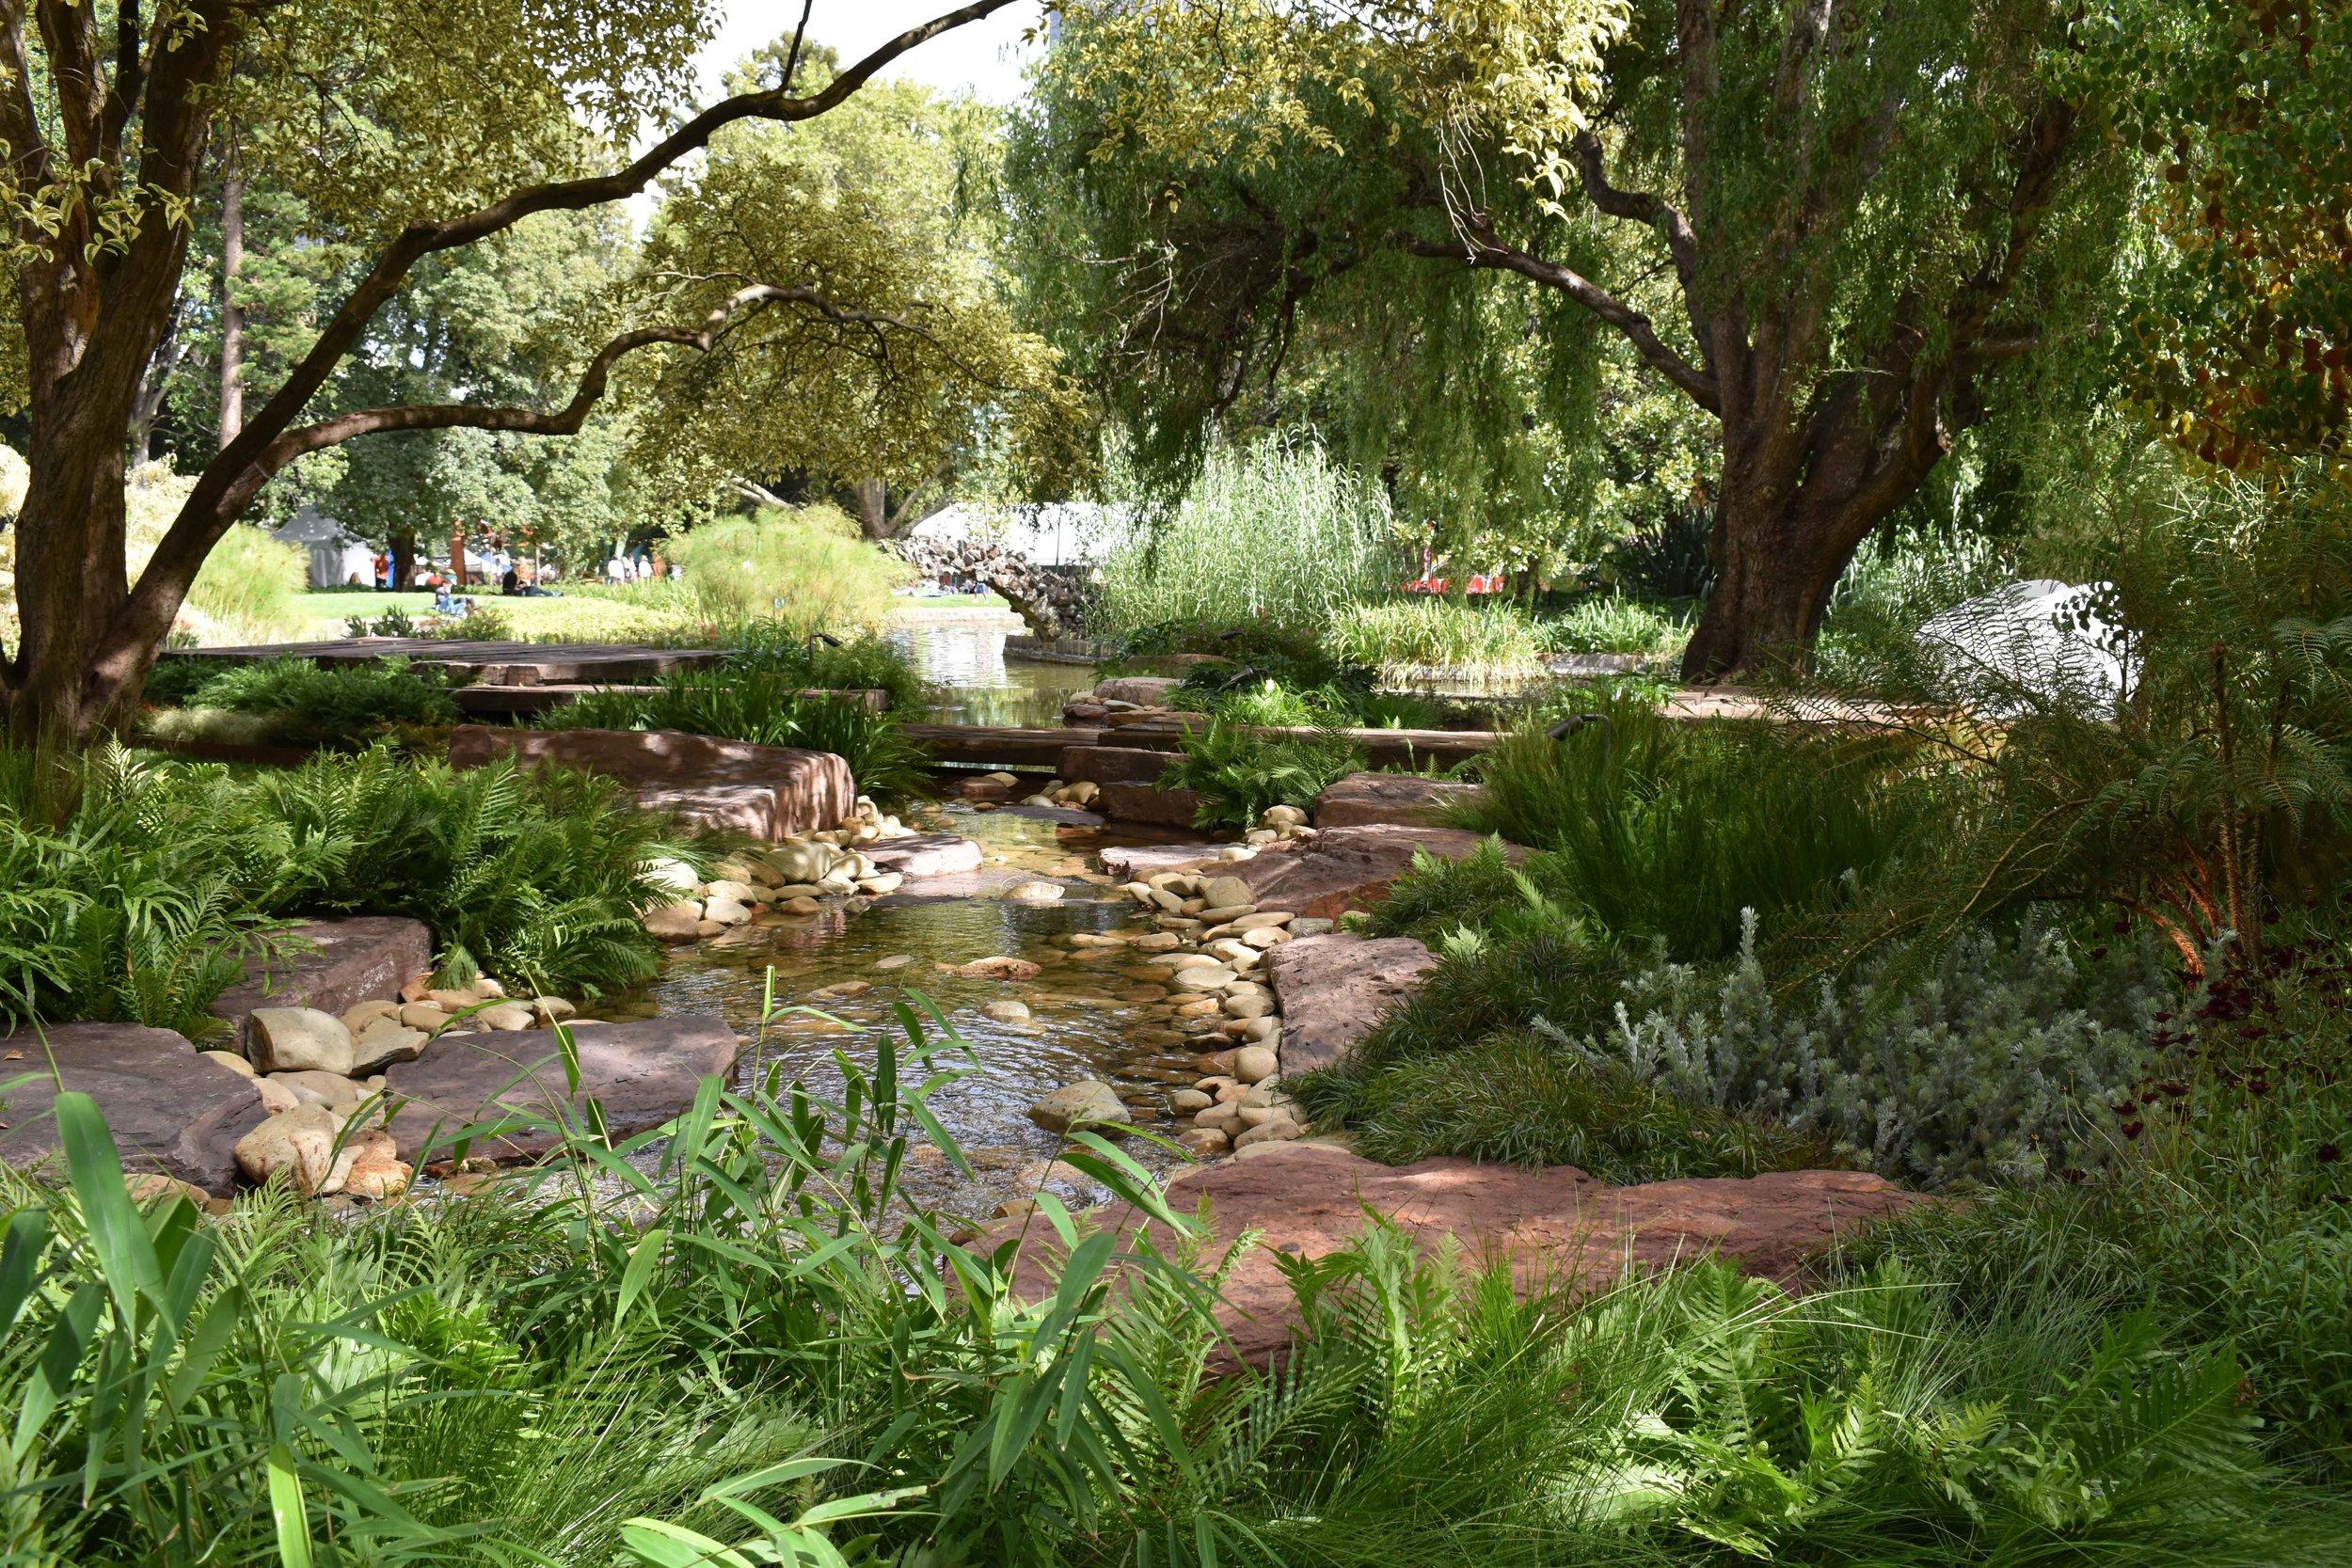 Legacies - Tree and Shrub Growers Victoria